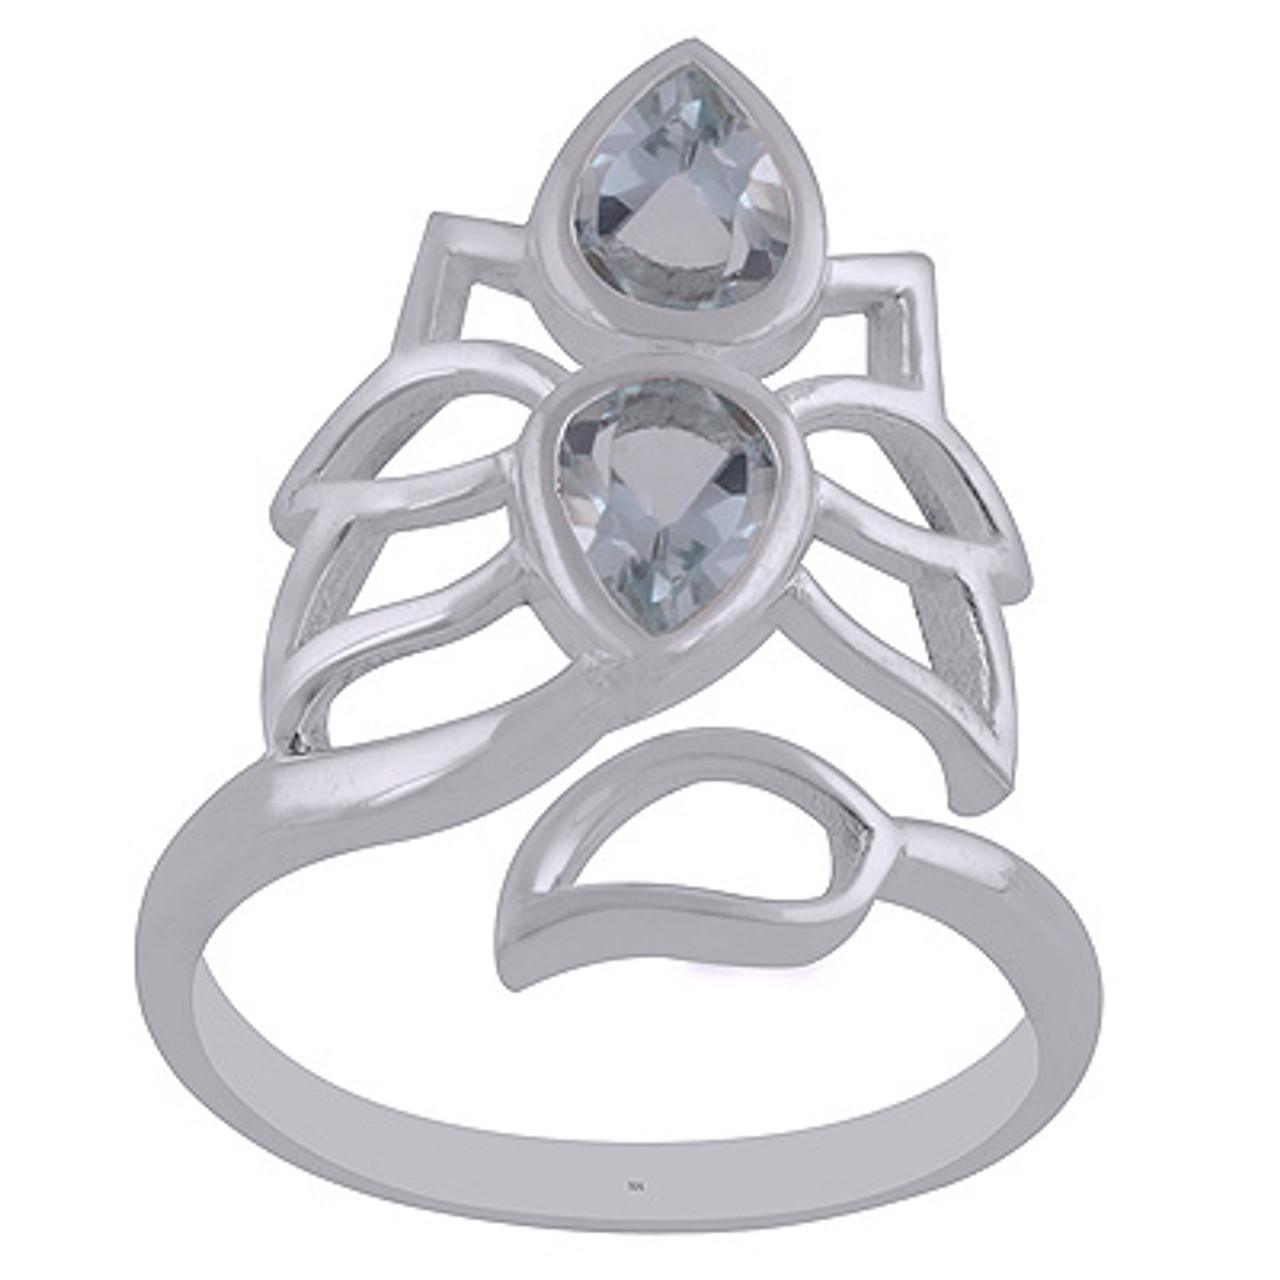 Sunshine Summer Vibe Adjustable Ring